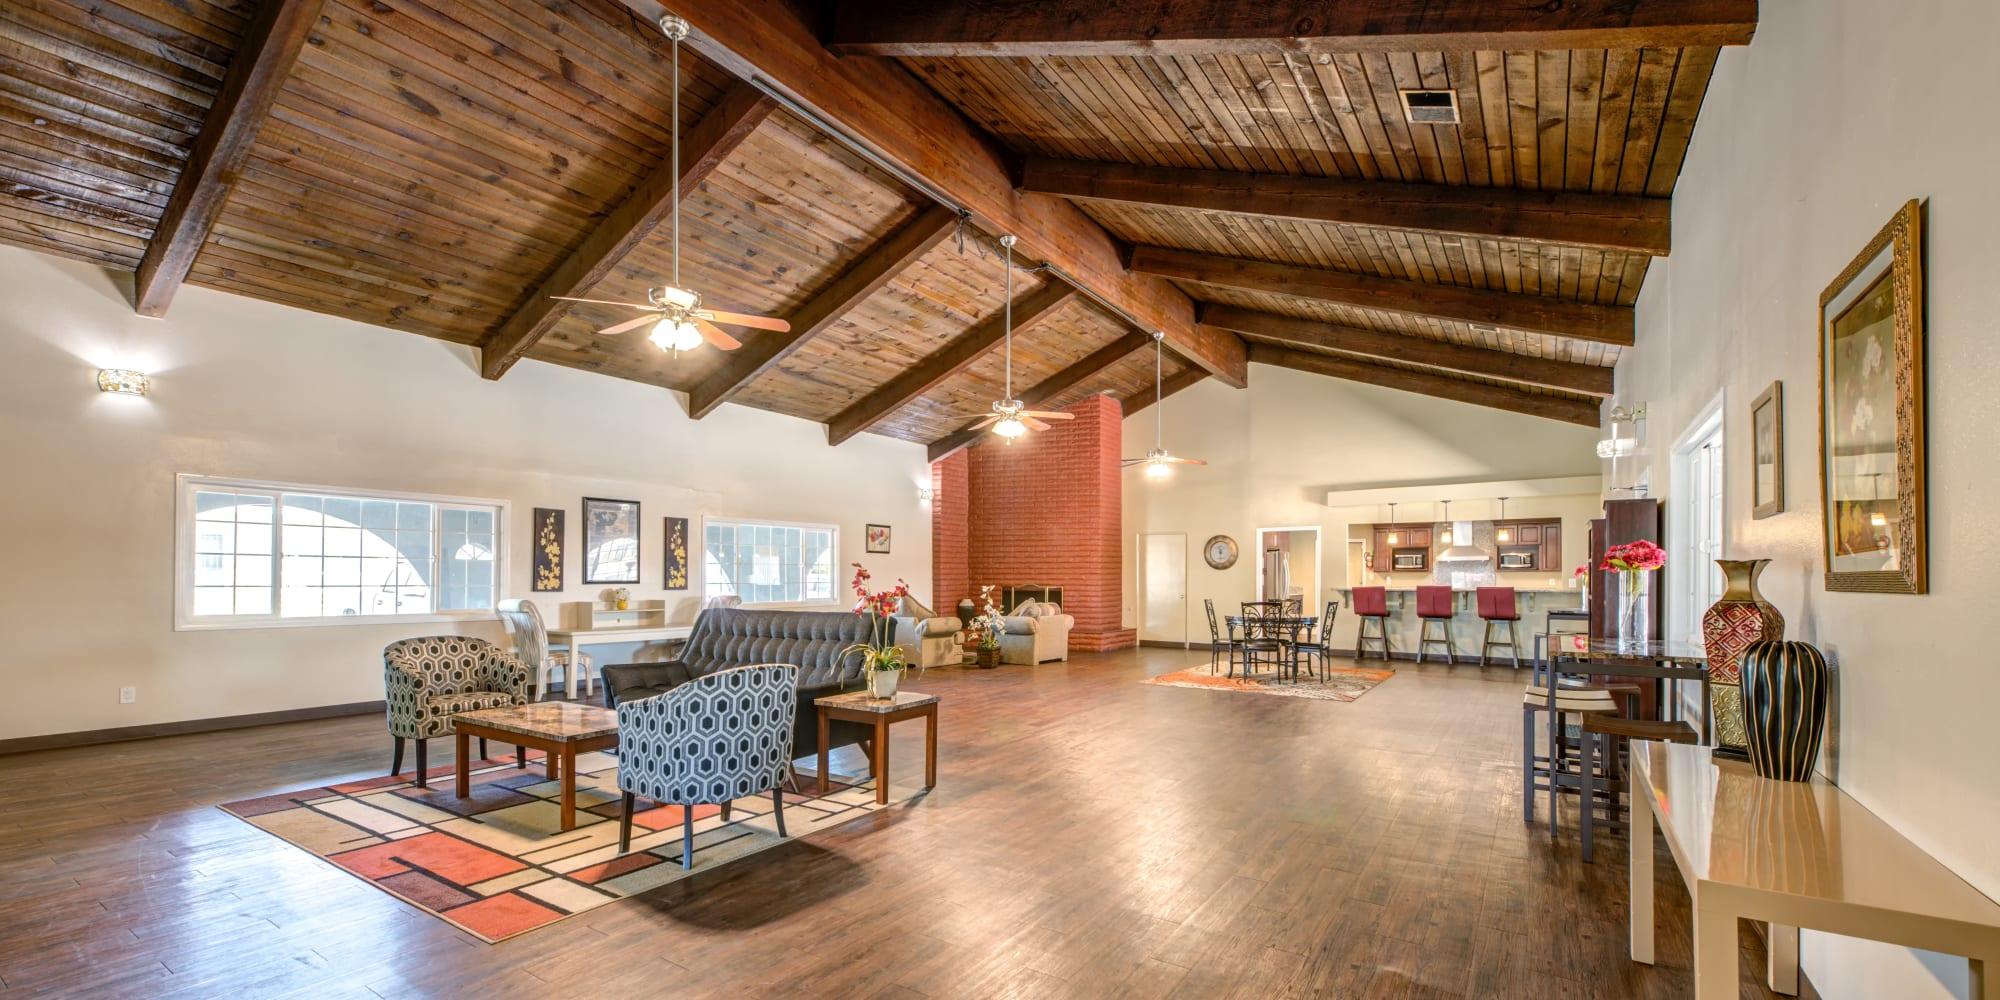 FollettMHC in Sacramento, California offers manufactured home communities